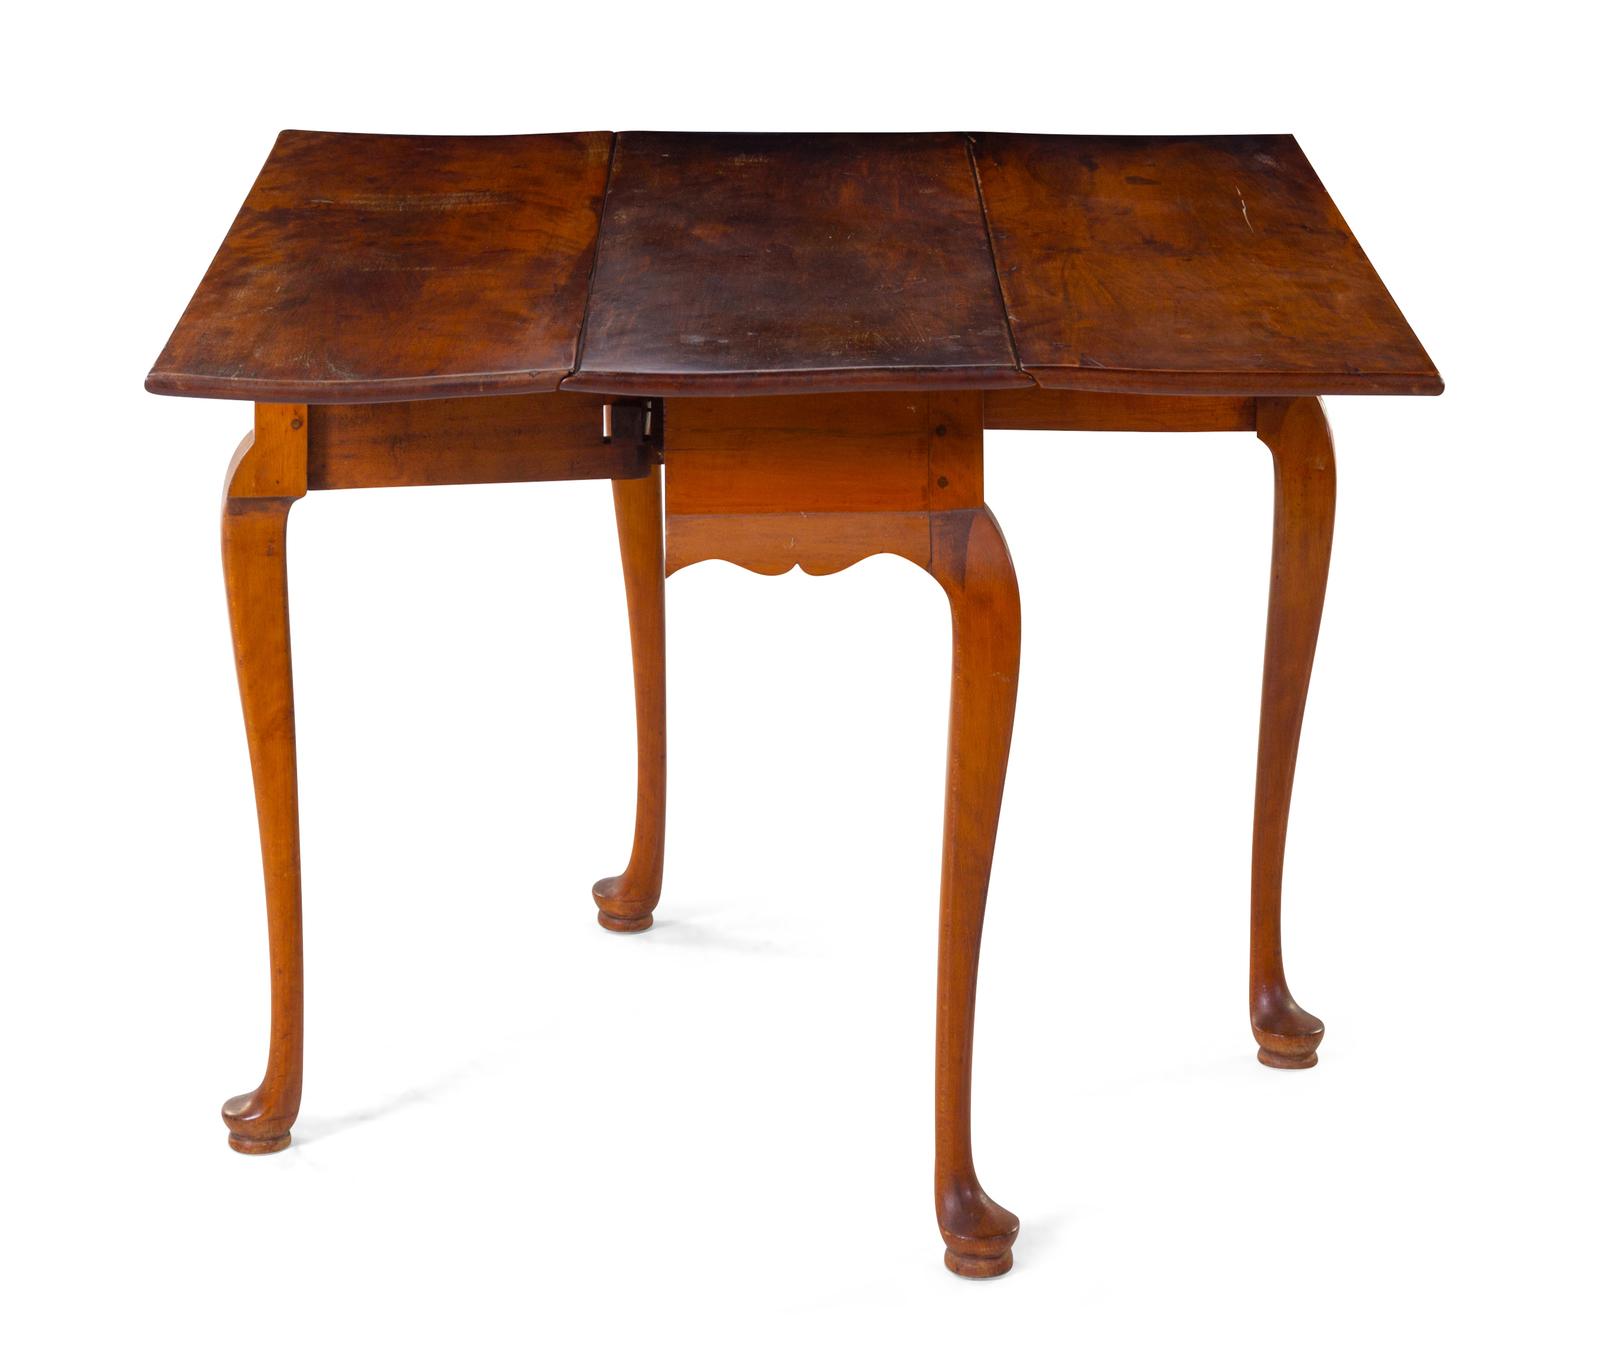 A Queen Anne Cherry Drop-Leaf Table